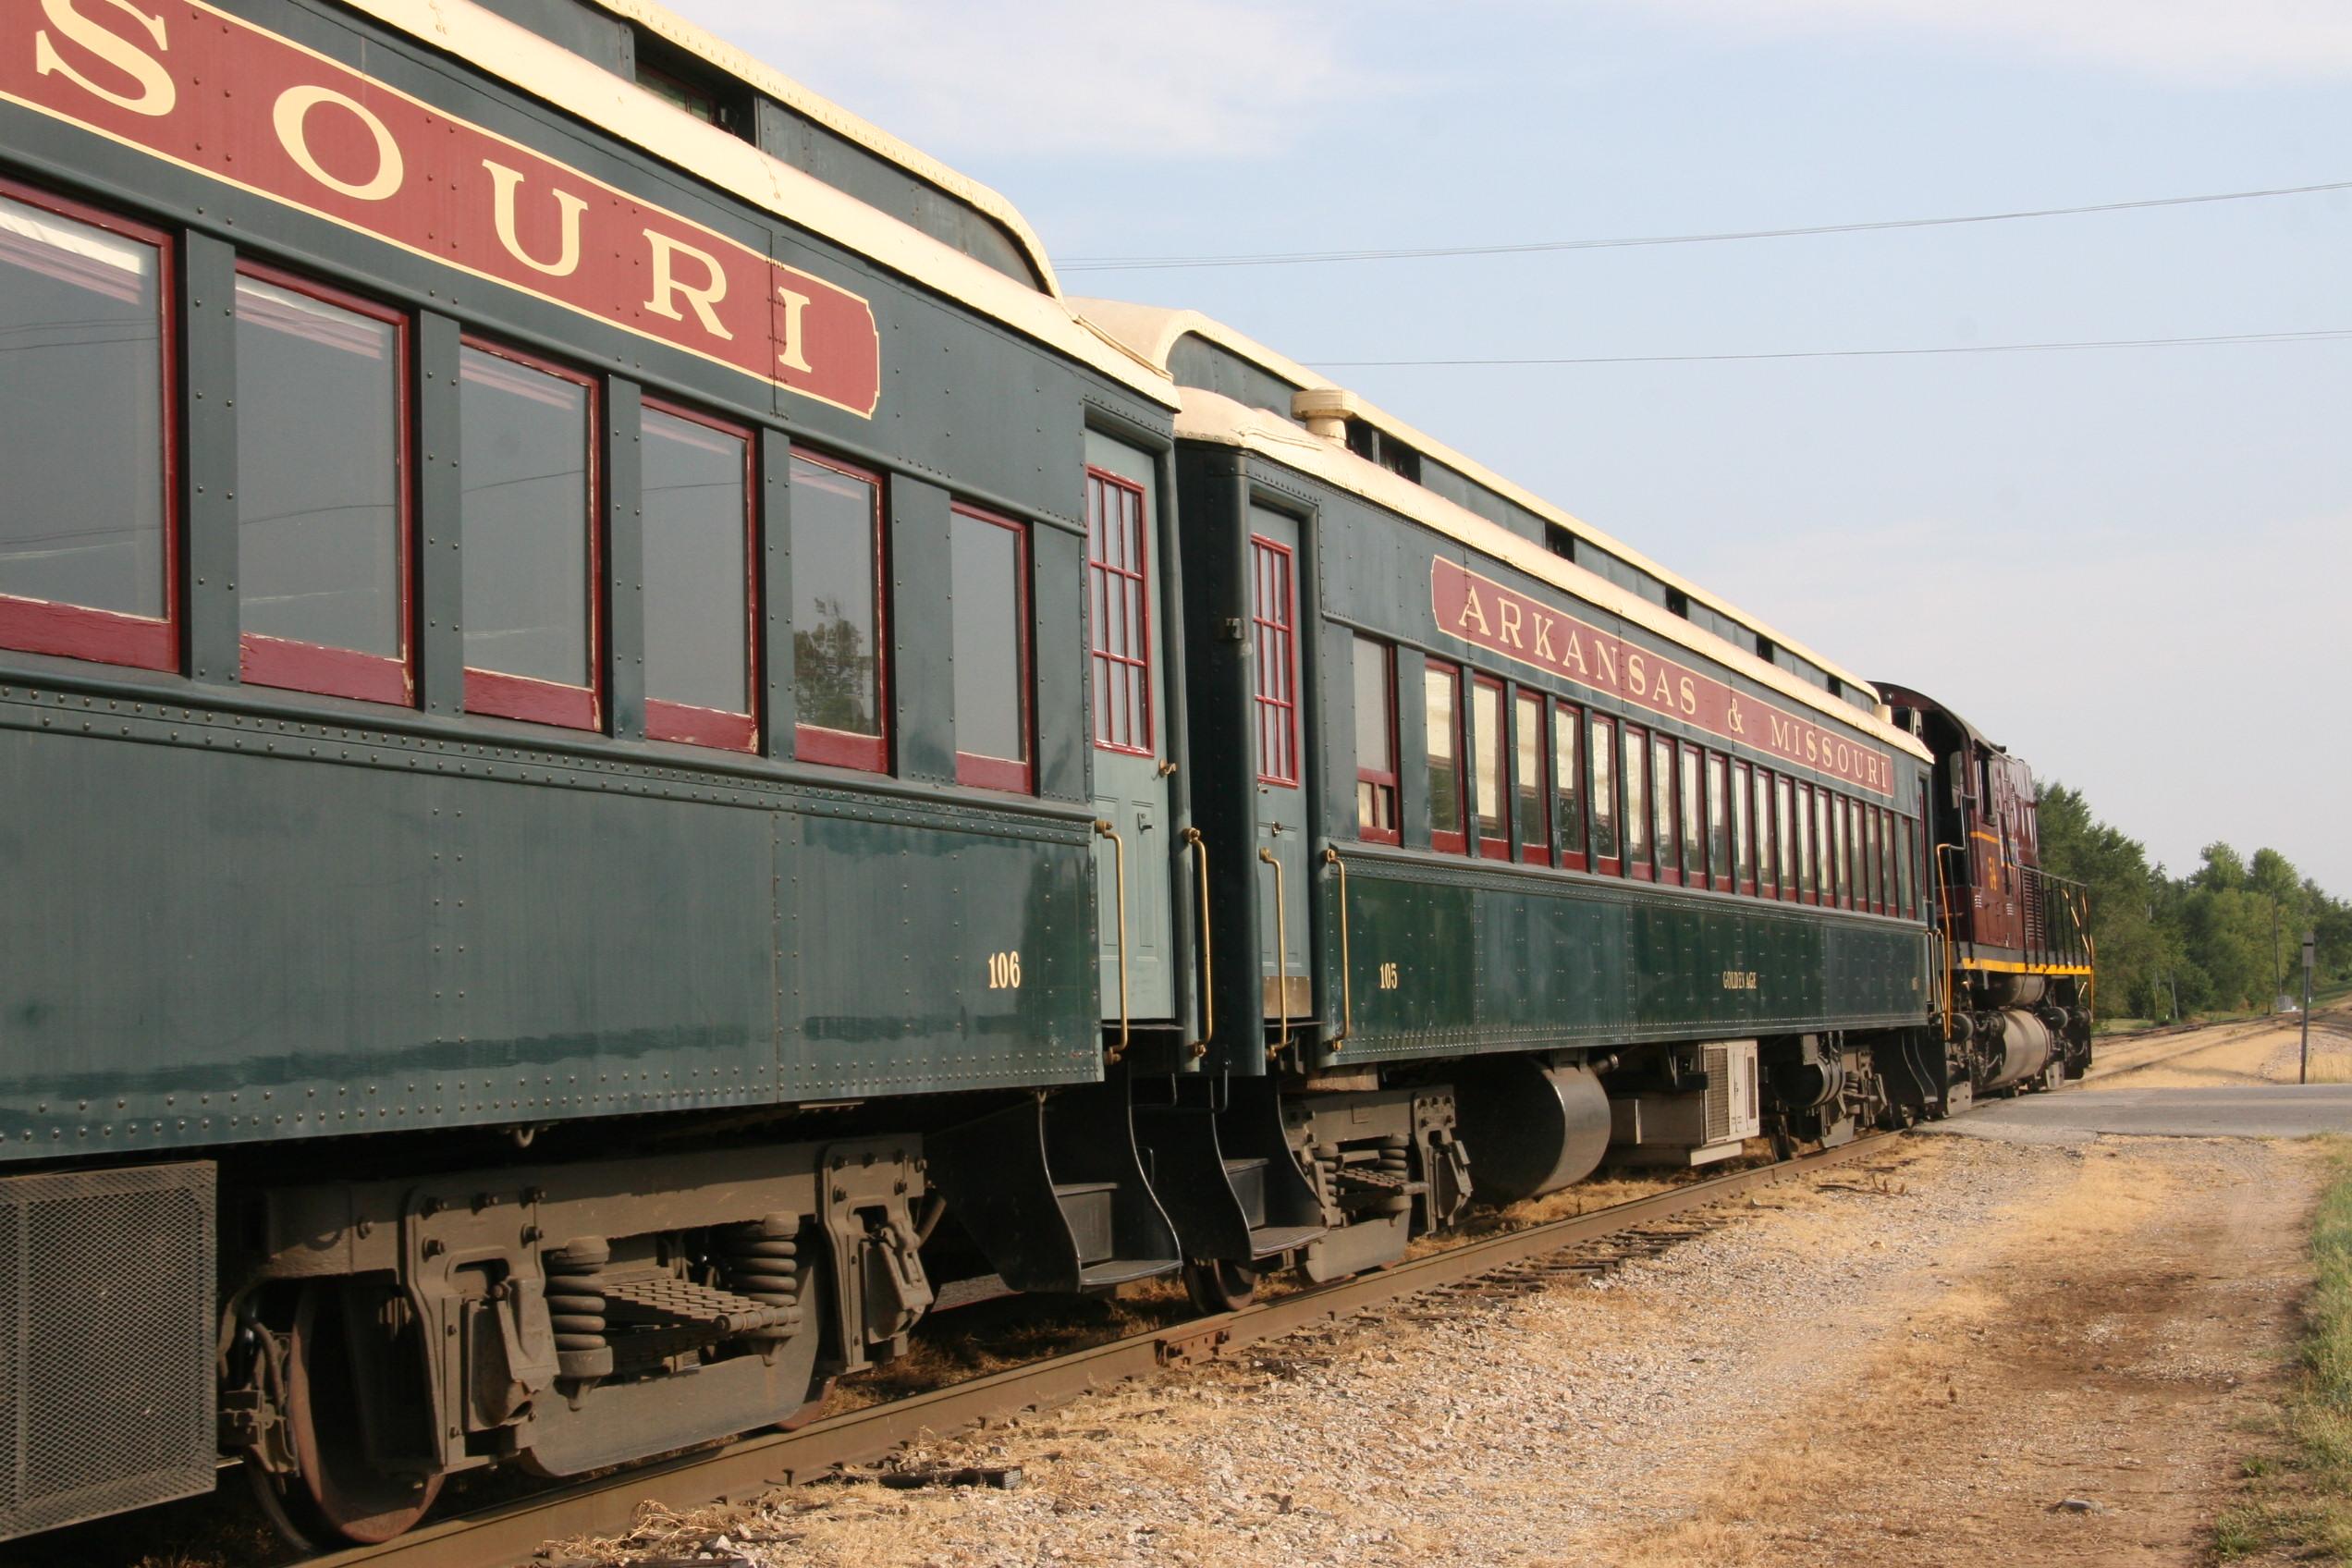 Cowcatcher Magazine All About The Community Of Model Railroading Wiring Ho Track Car Arkansas Missouri Railroads Fall Foliage Express Was A Close Second To Durango